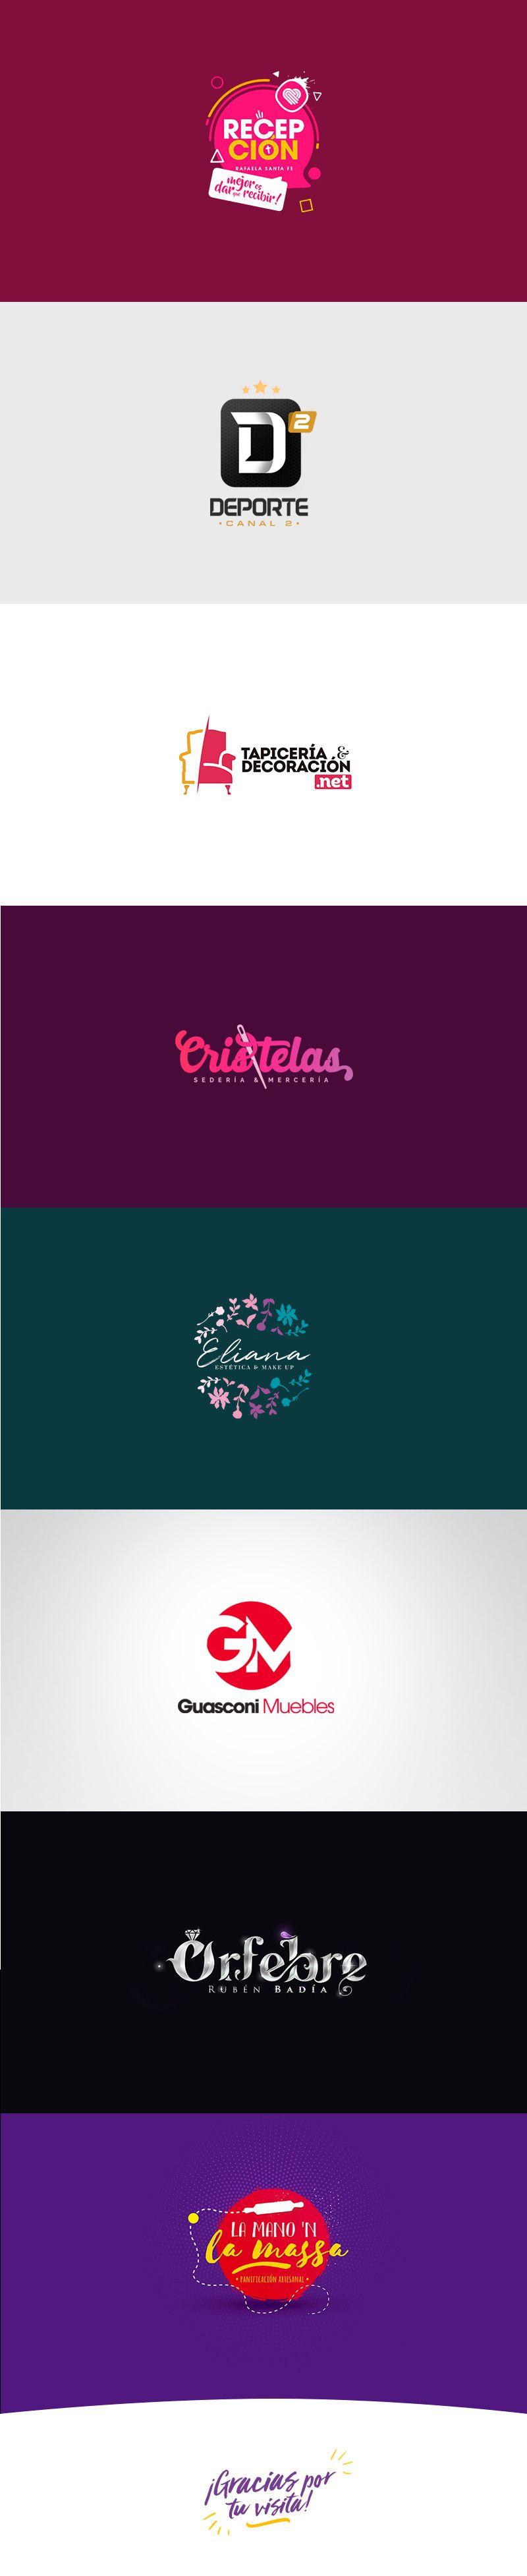 C924f859405735 5a20a21f9ef1e Jpg 800 3908 Pinterest  # Muebles Rafaela